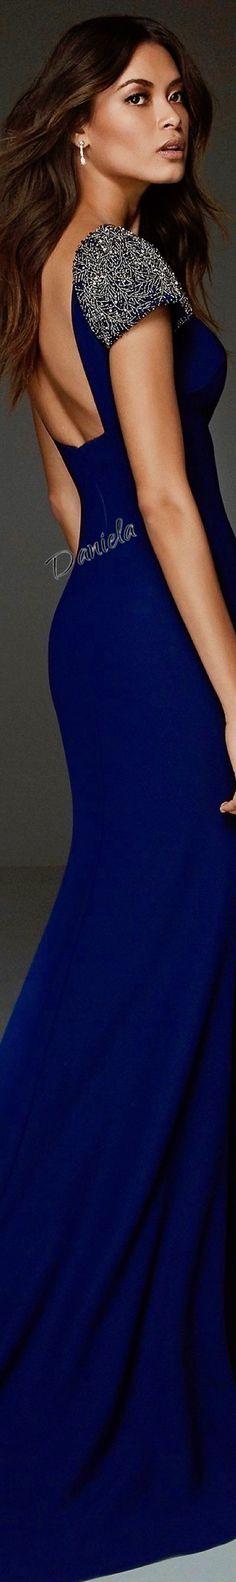 Explore our Wedding Dresses and feel Unique: One bride, One shape, One Unique dress. Discover our Cocktail Gowns from Pronovias. Unique Dresses, Pretty Dresses, Formal Dresses, Pronovias Wedding Dress, Wedding Dresses, Lady Luxury, Feel Unique, Cocktail Gowns, Bridal Stores